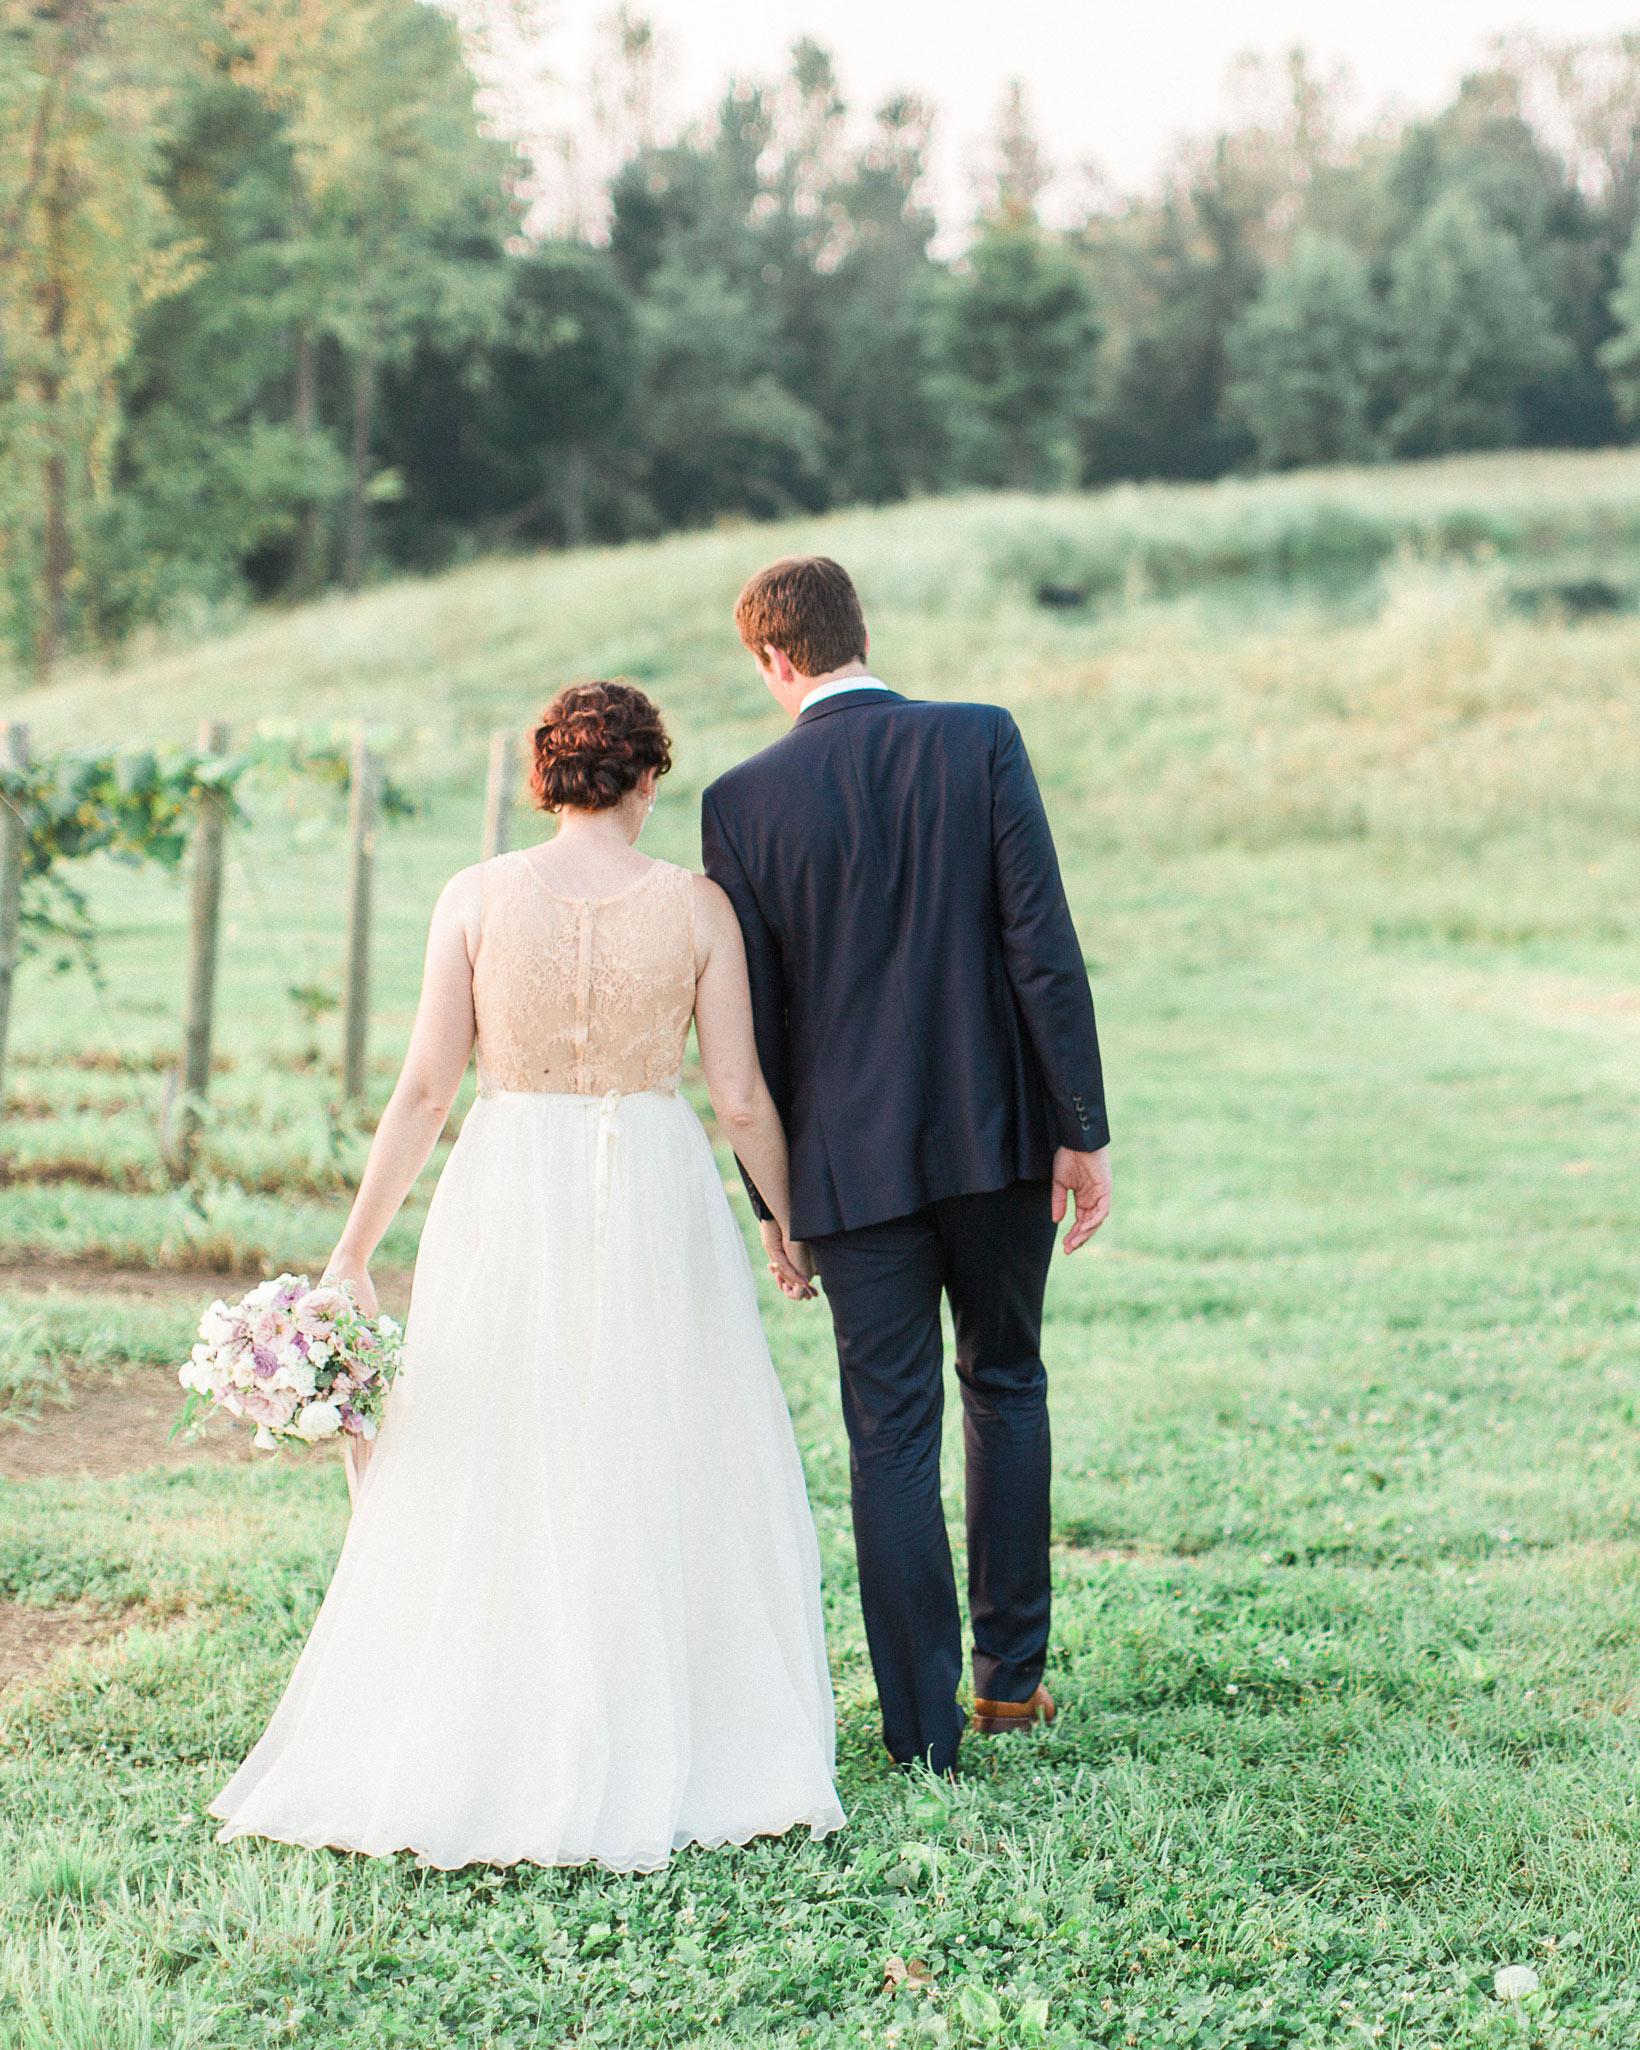 sarah-michael-wedding-couple-940-s112783-0416.jpg